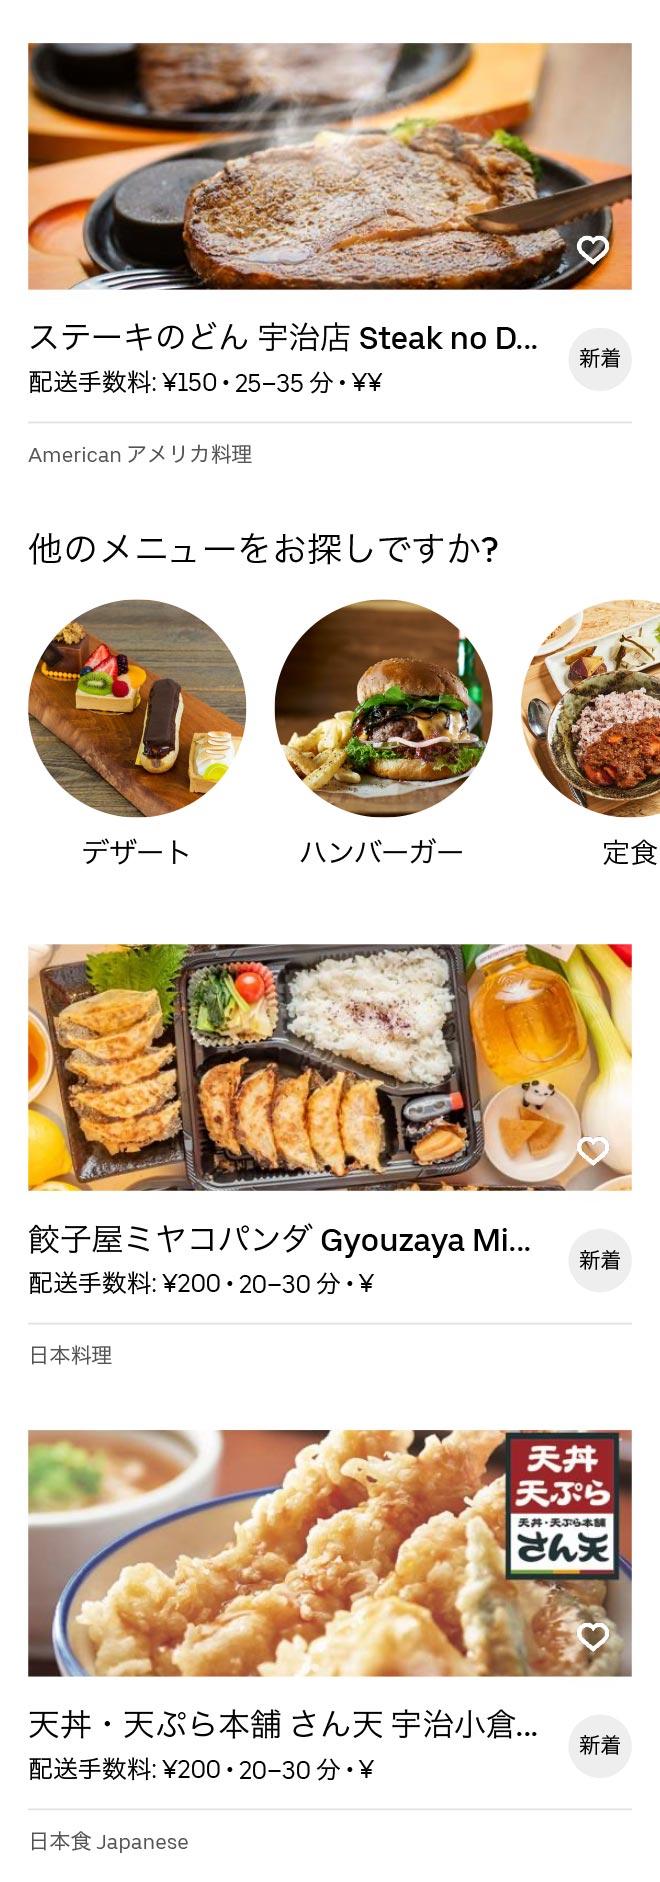 Uji menu 2005 03